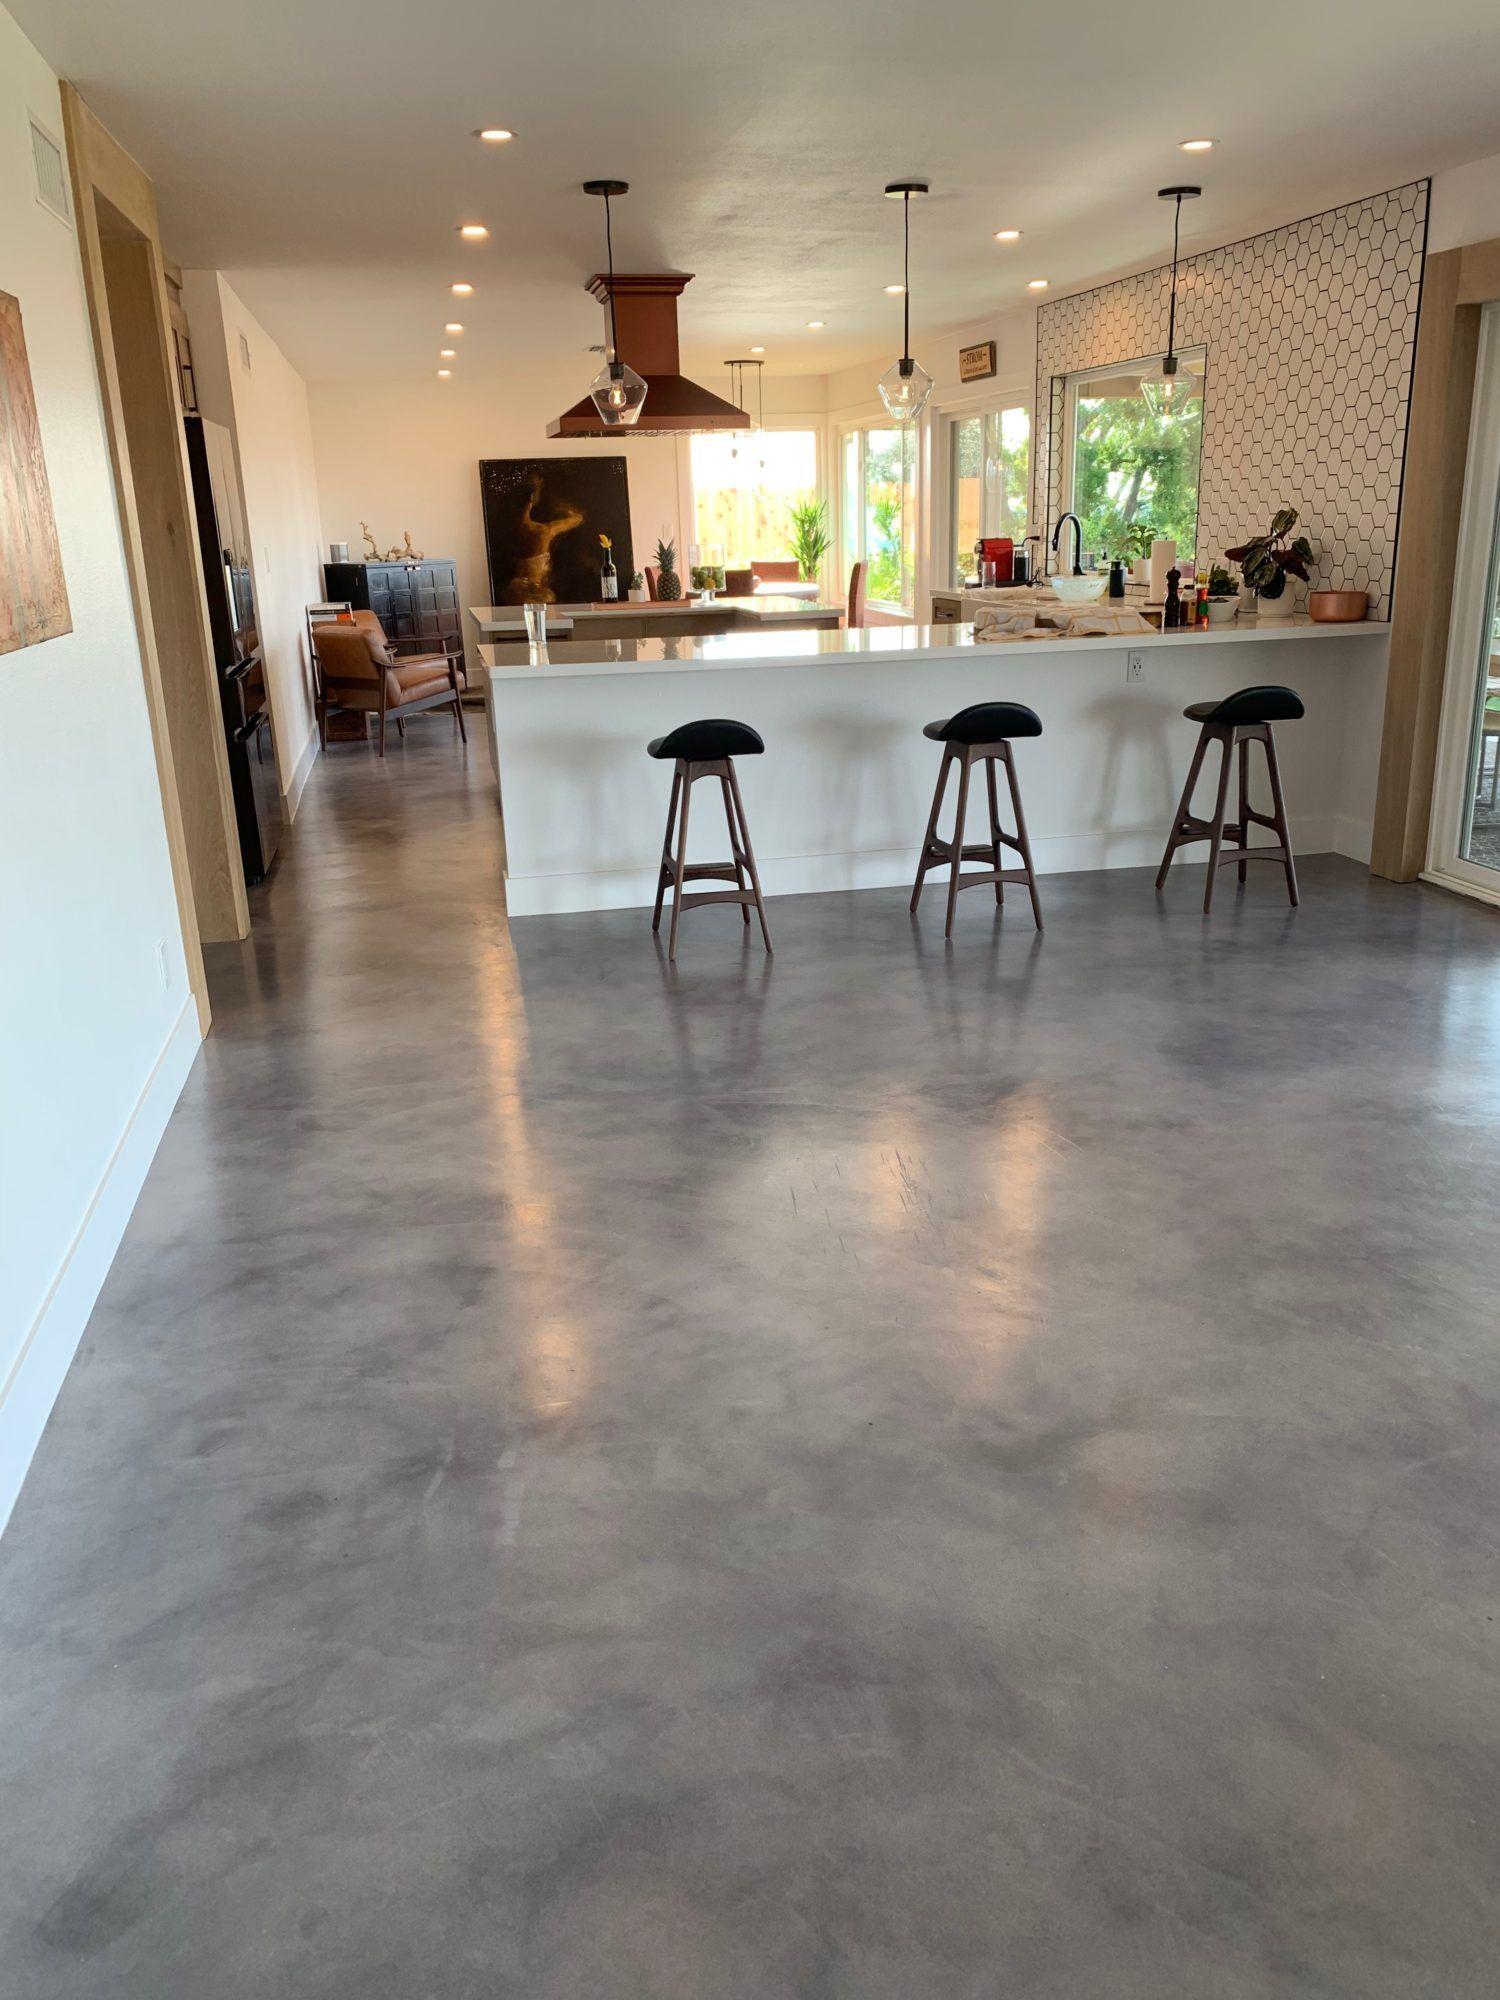 Ideal Basement Floor Paint Ideas In 2020 Painted Concrete Floors